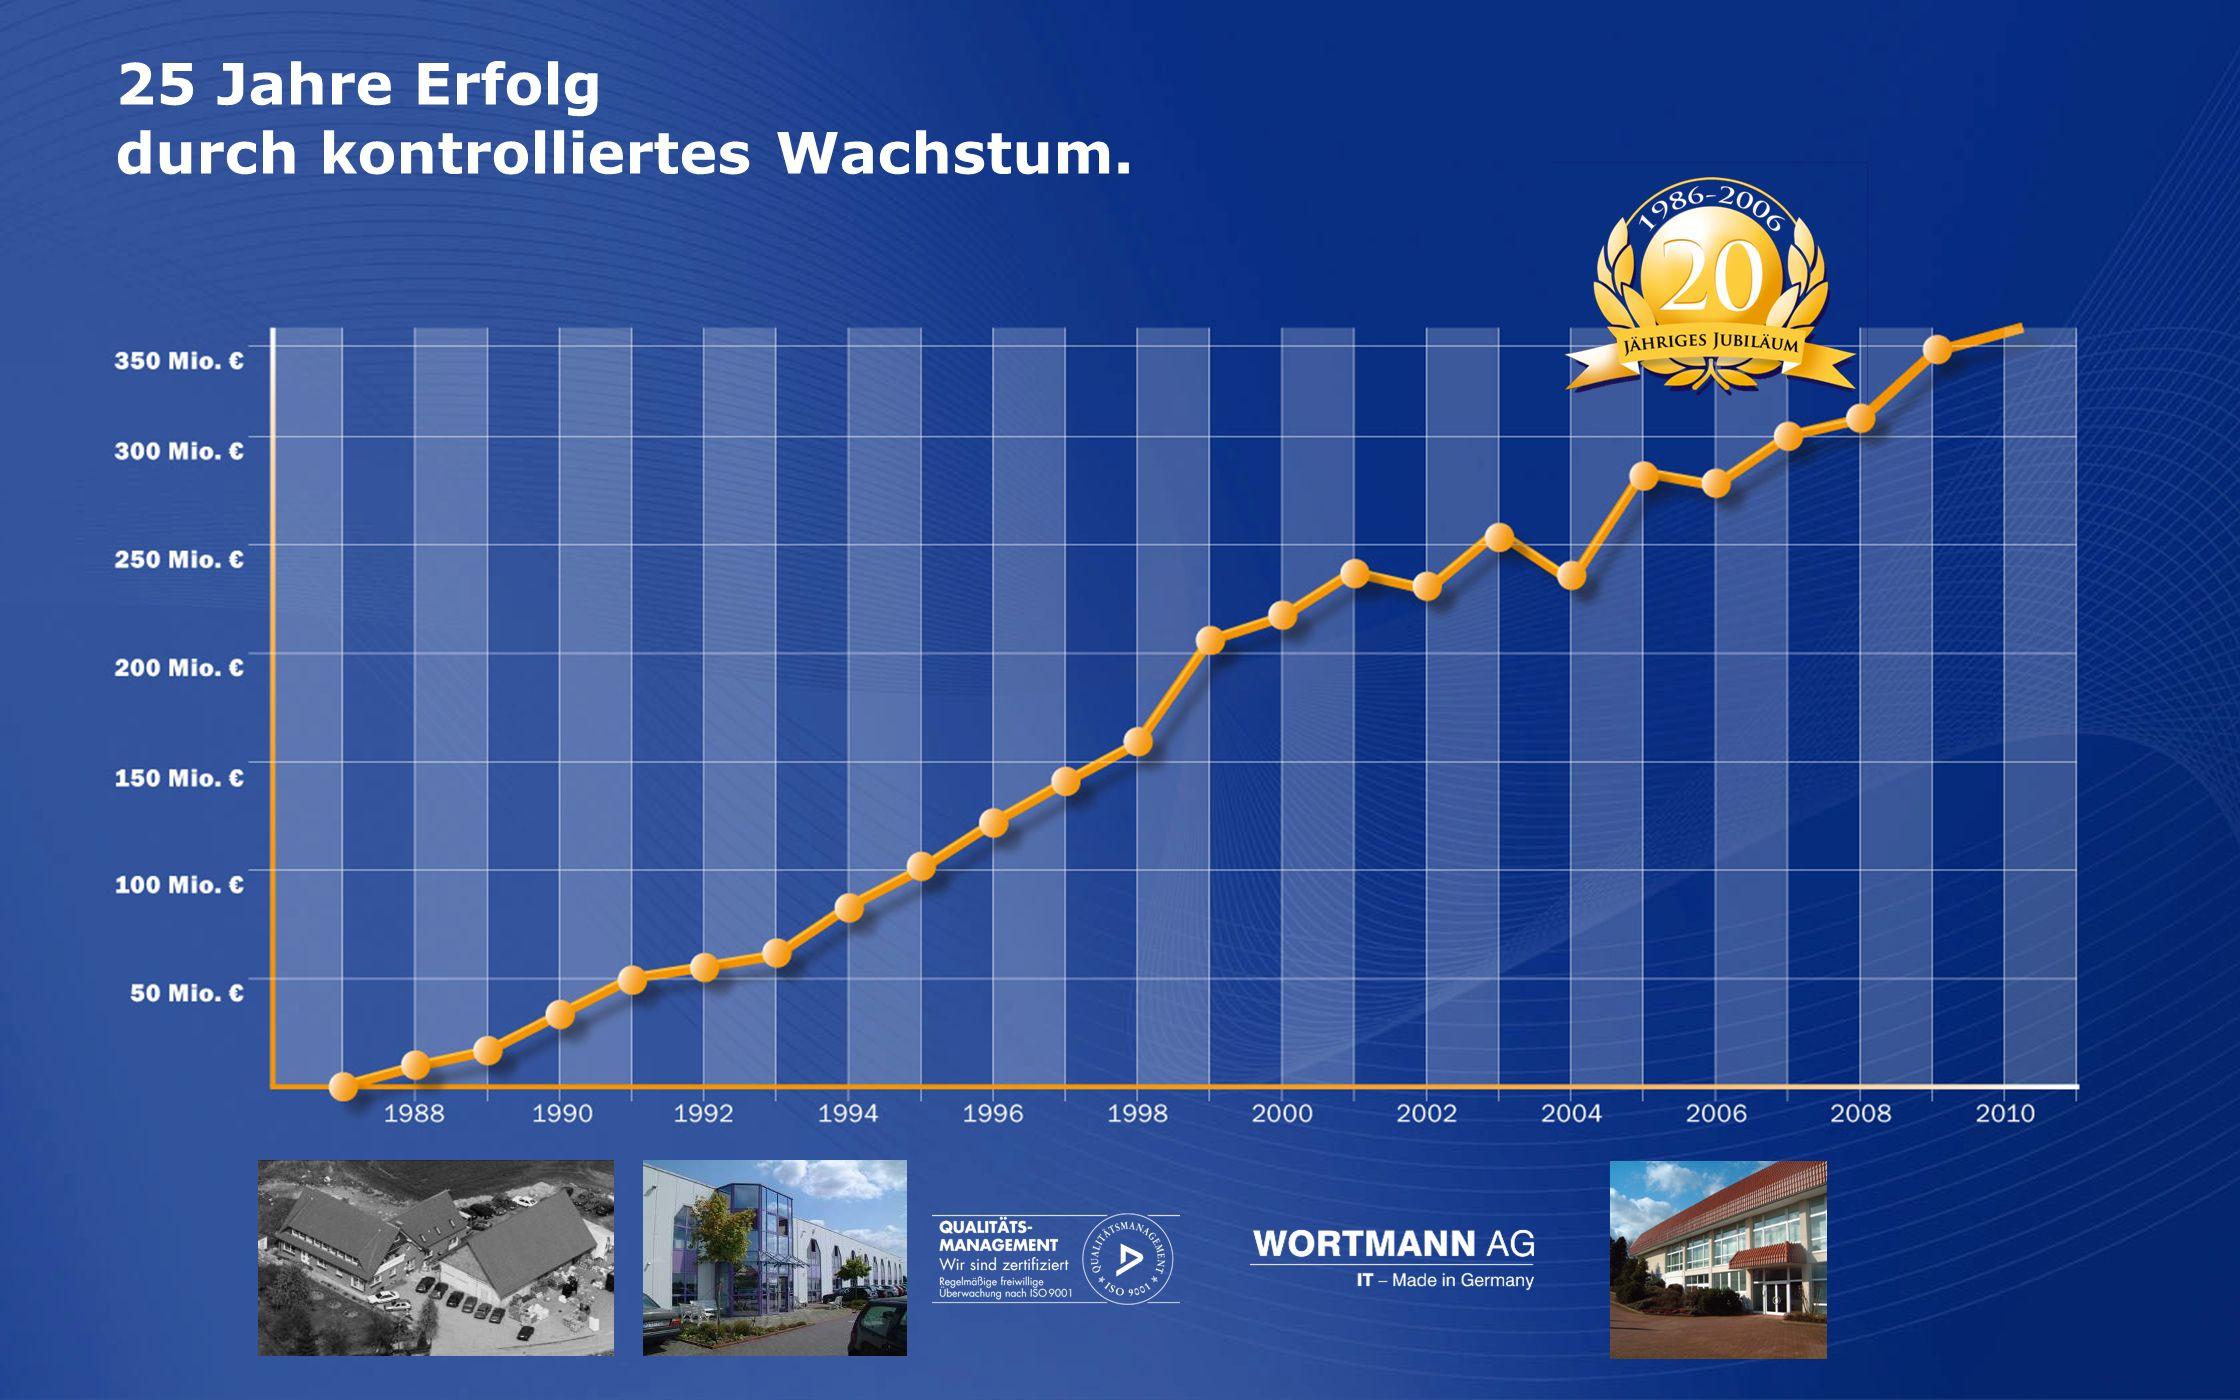 www.wortmann.de TERRA LCD POSITIONIERUNG MOBILE PC LCD SERVER STORAGE FIREWALL THINCLIENT SERVICE